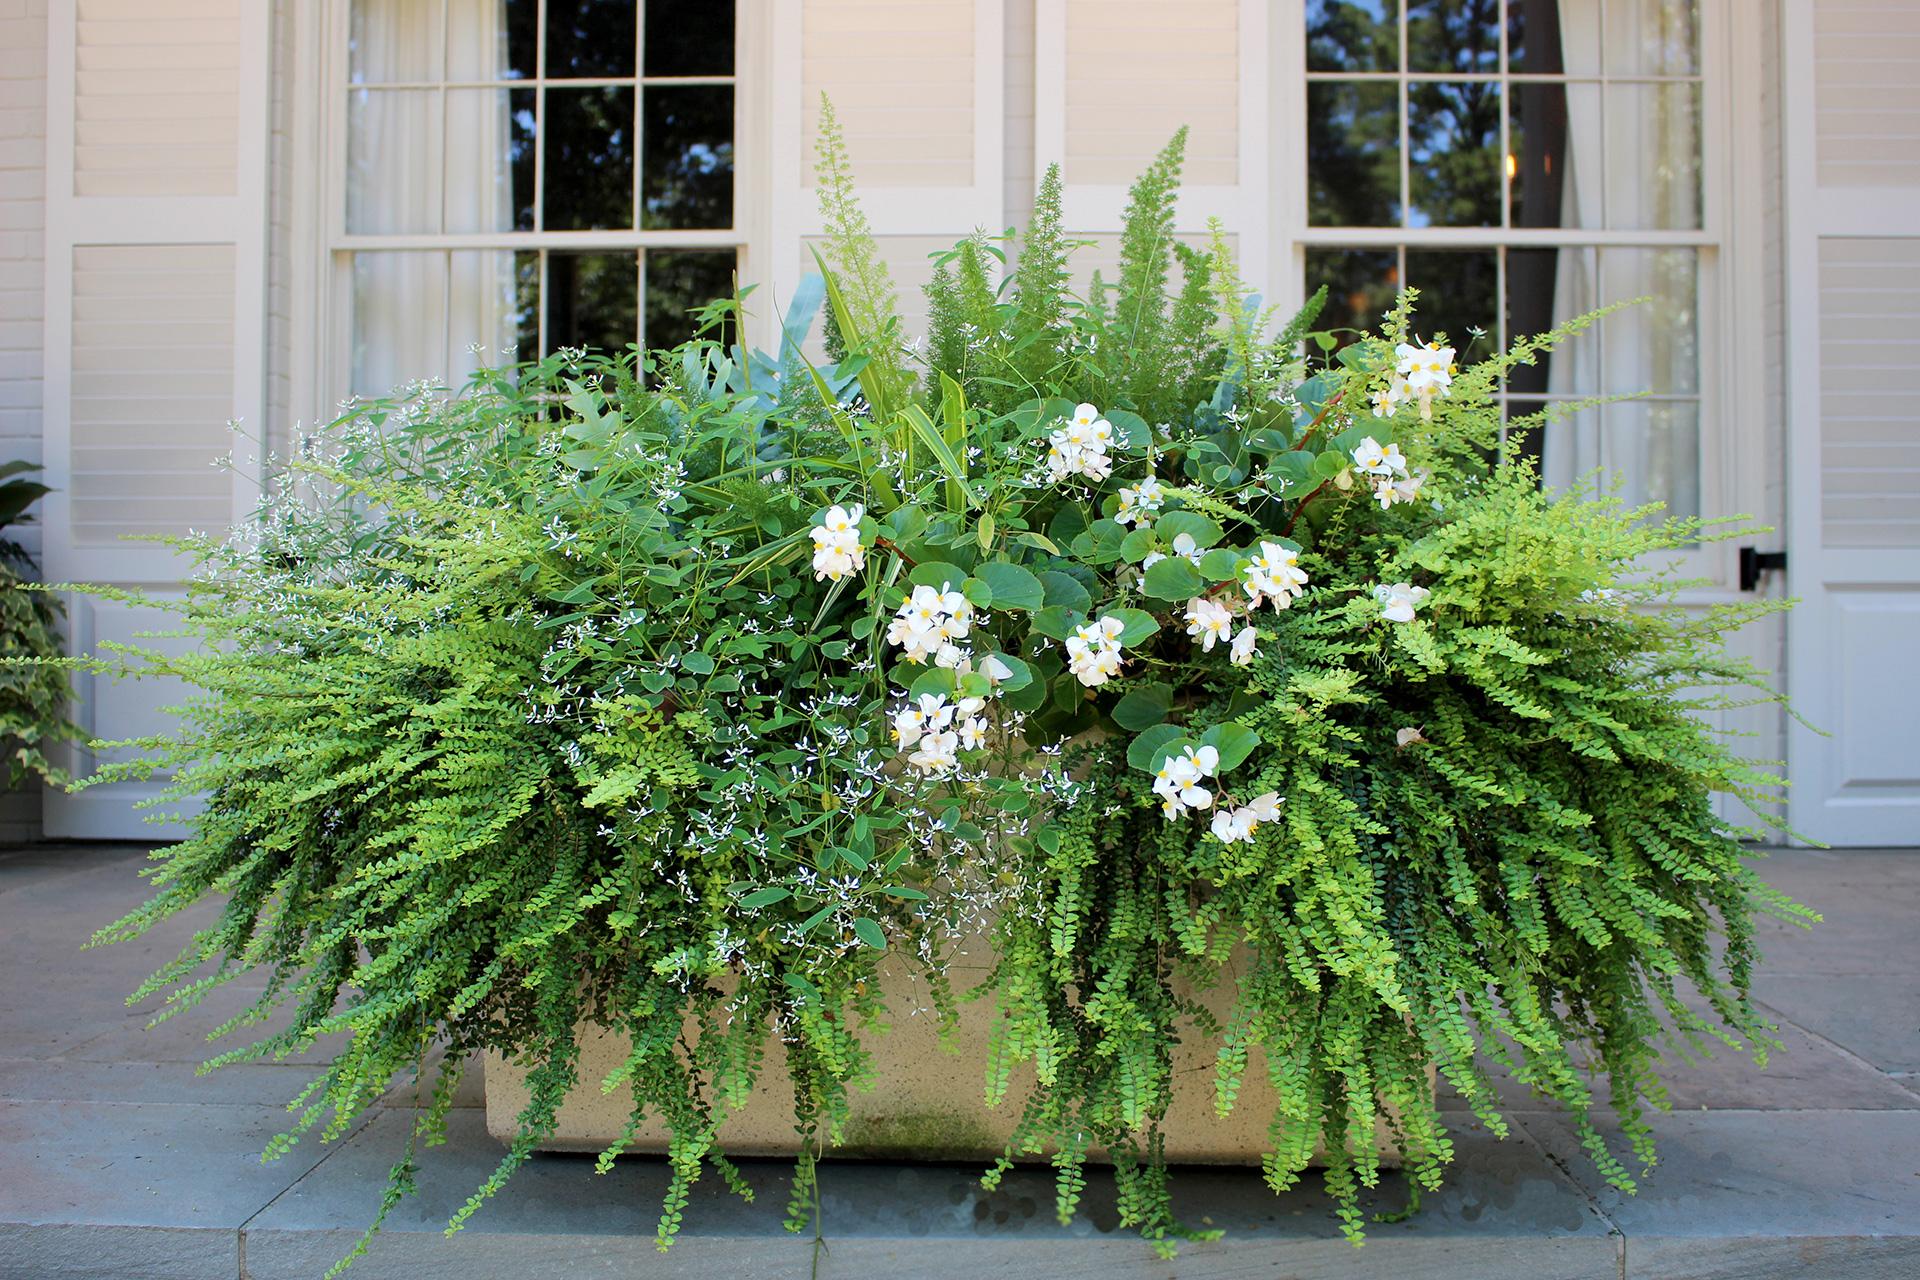 home_floralis_seasonal_2014_80